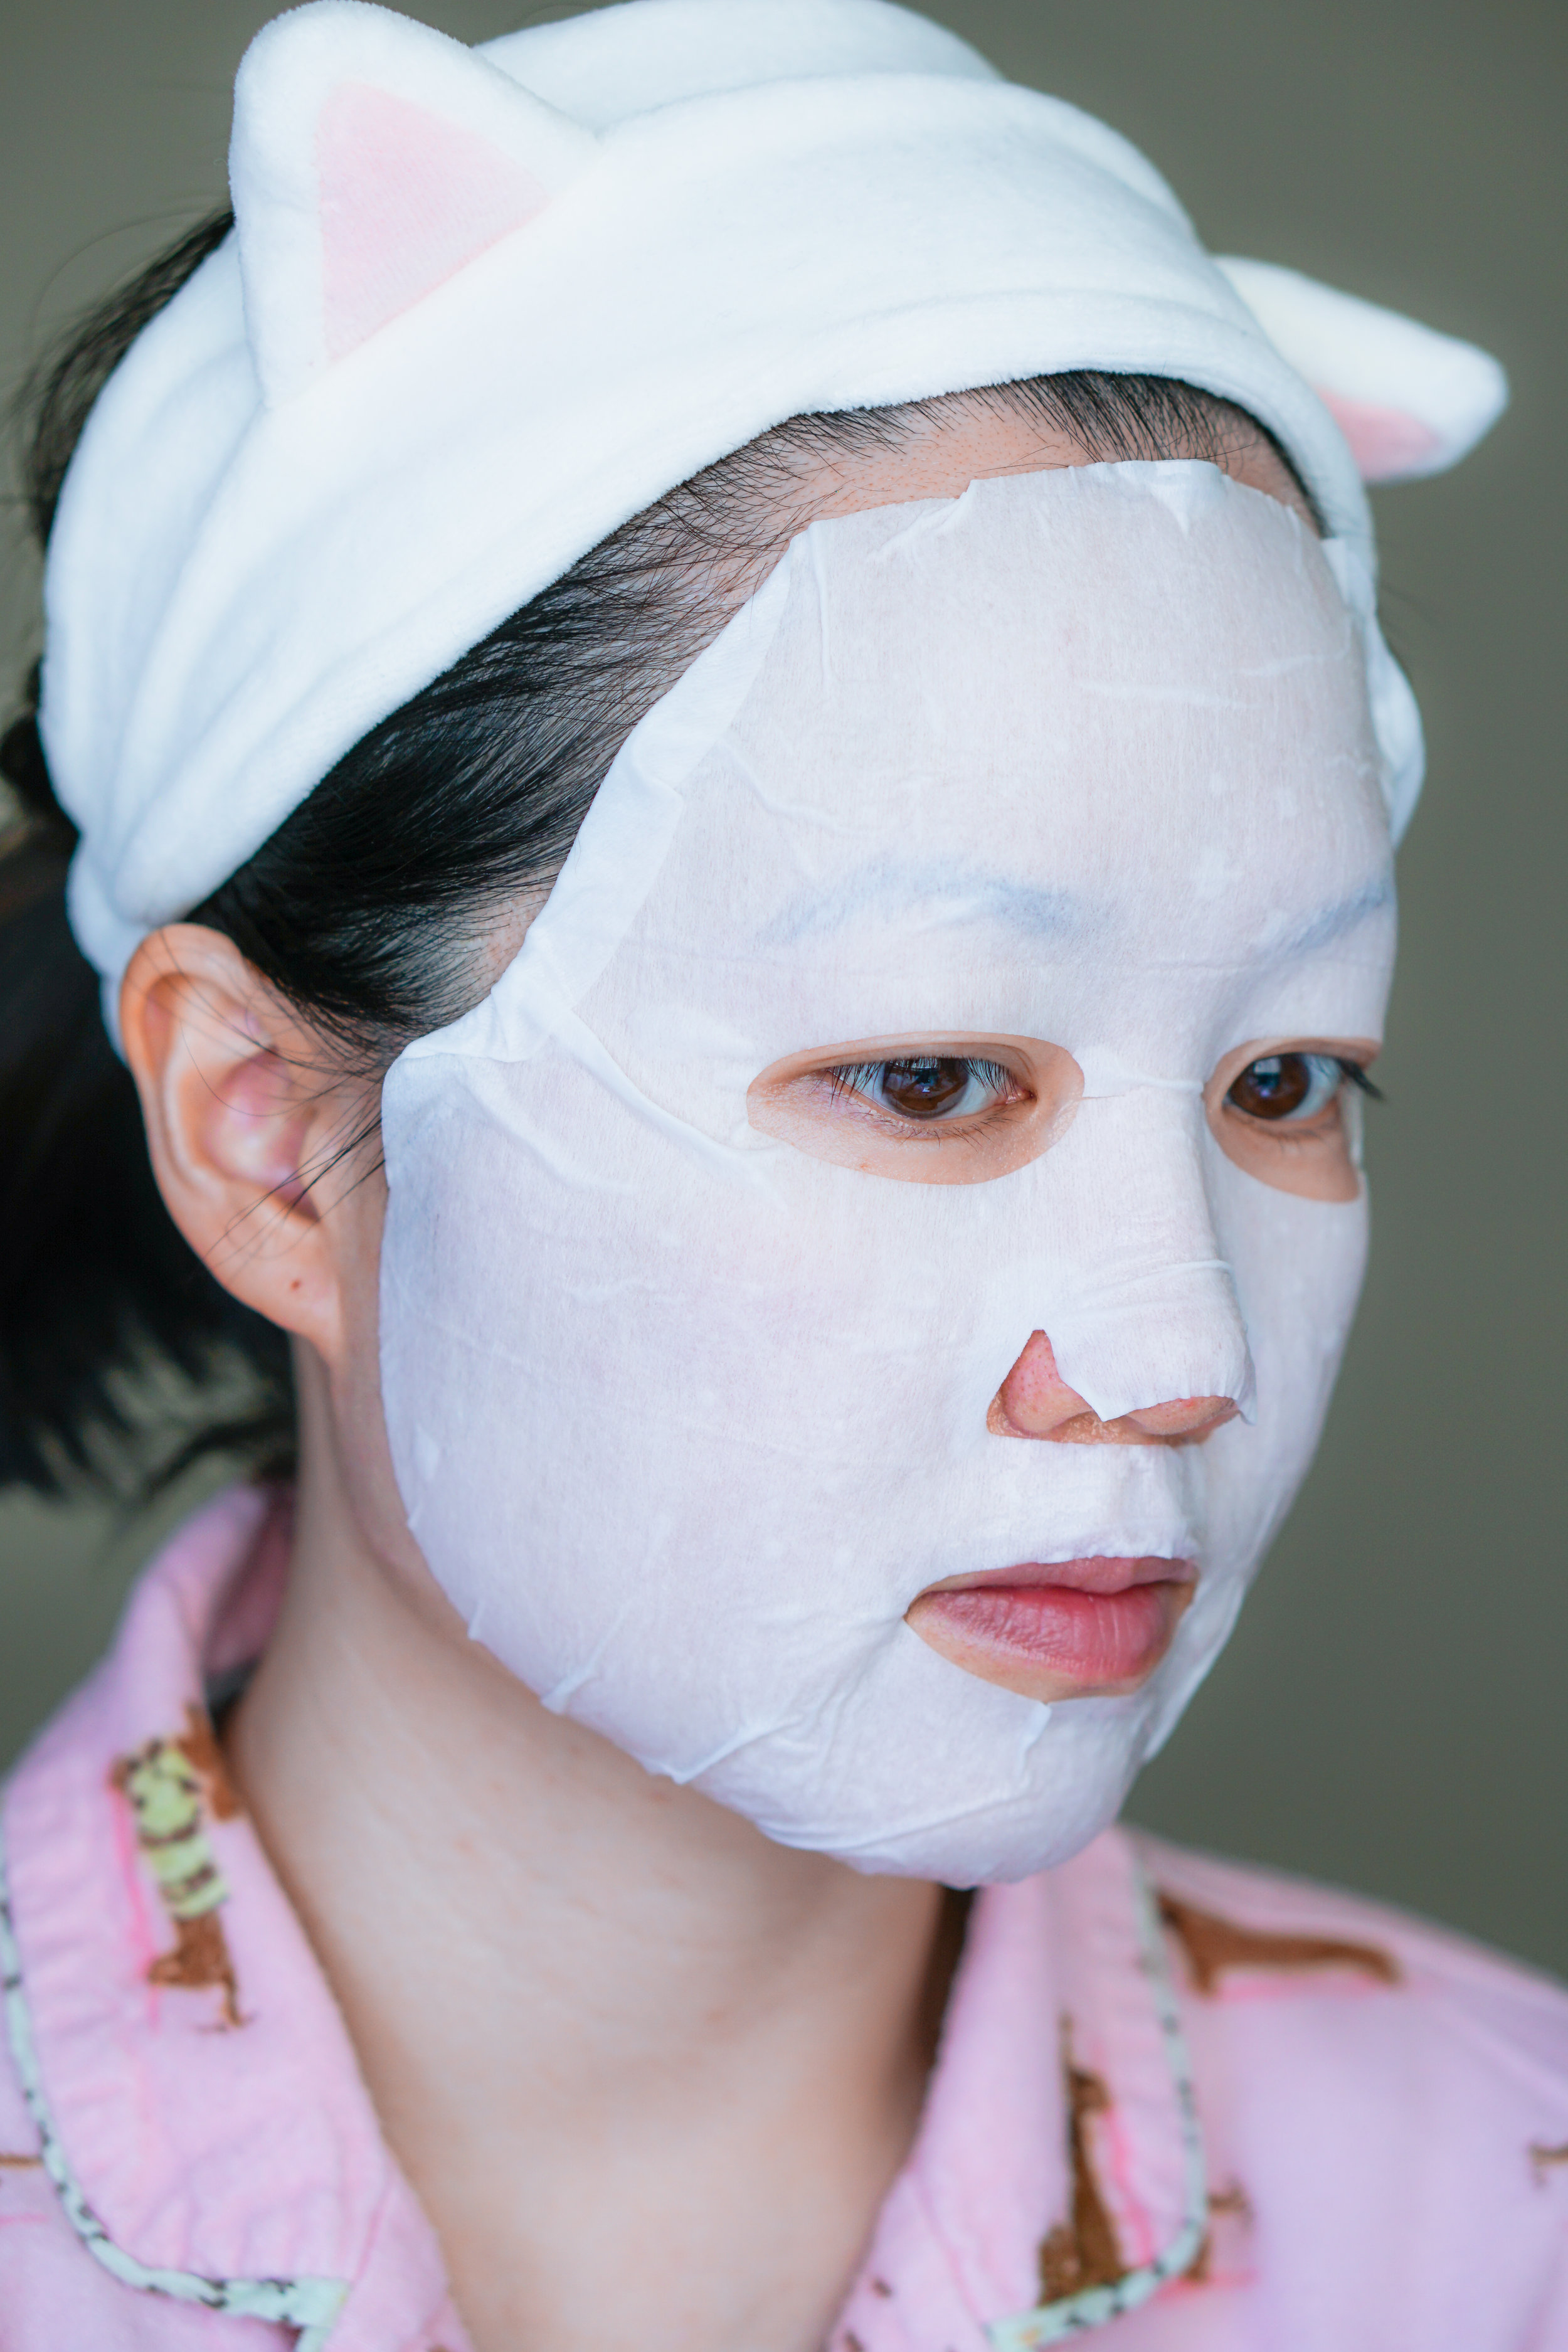 Jayjun AntiDust Whitening Mask Review_DSC07211-2.jpg